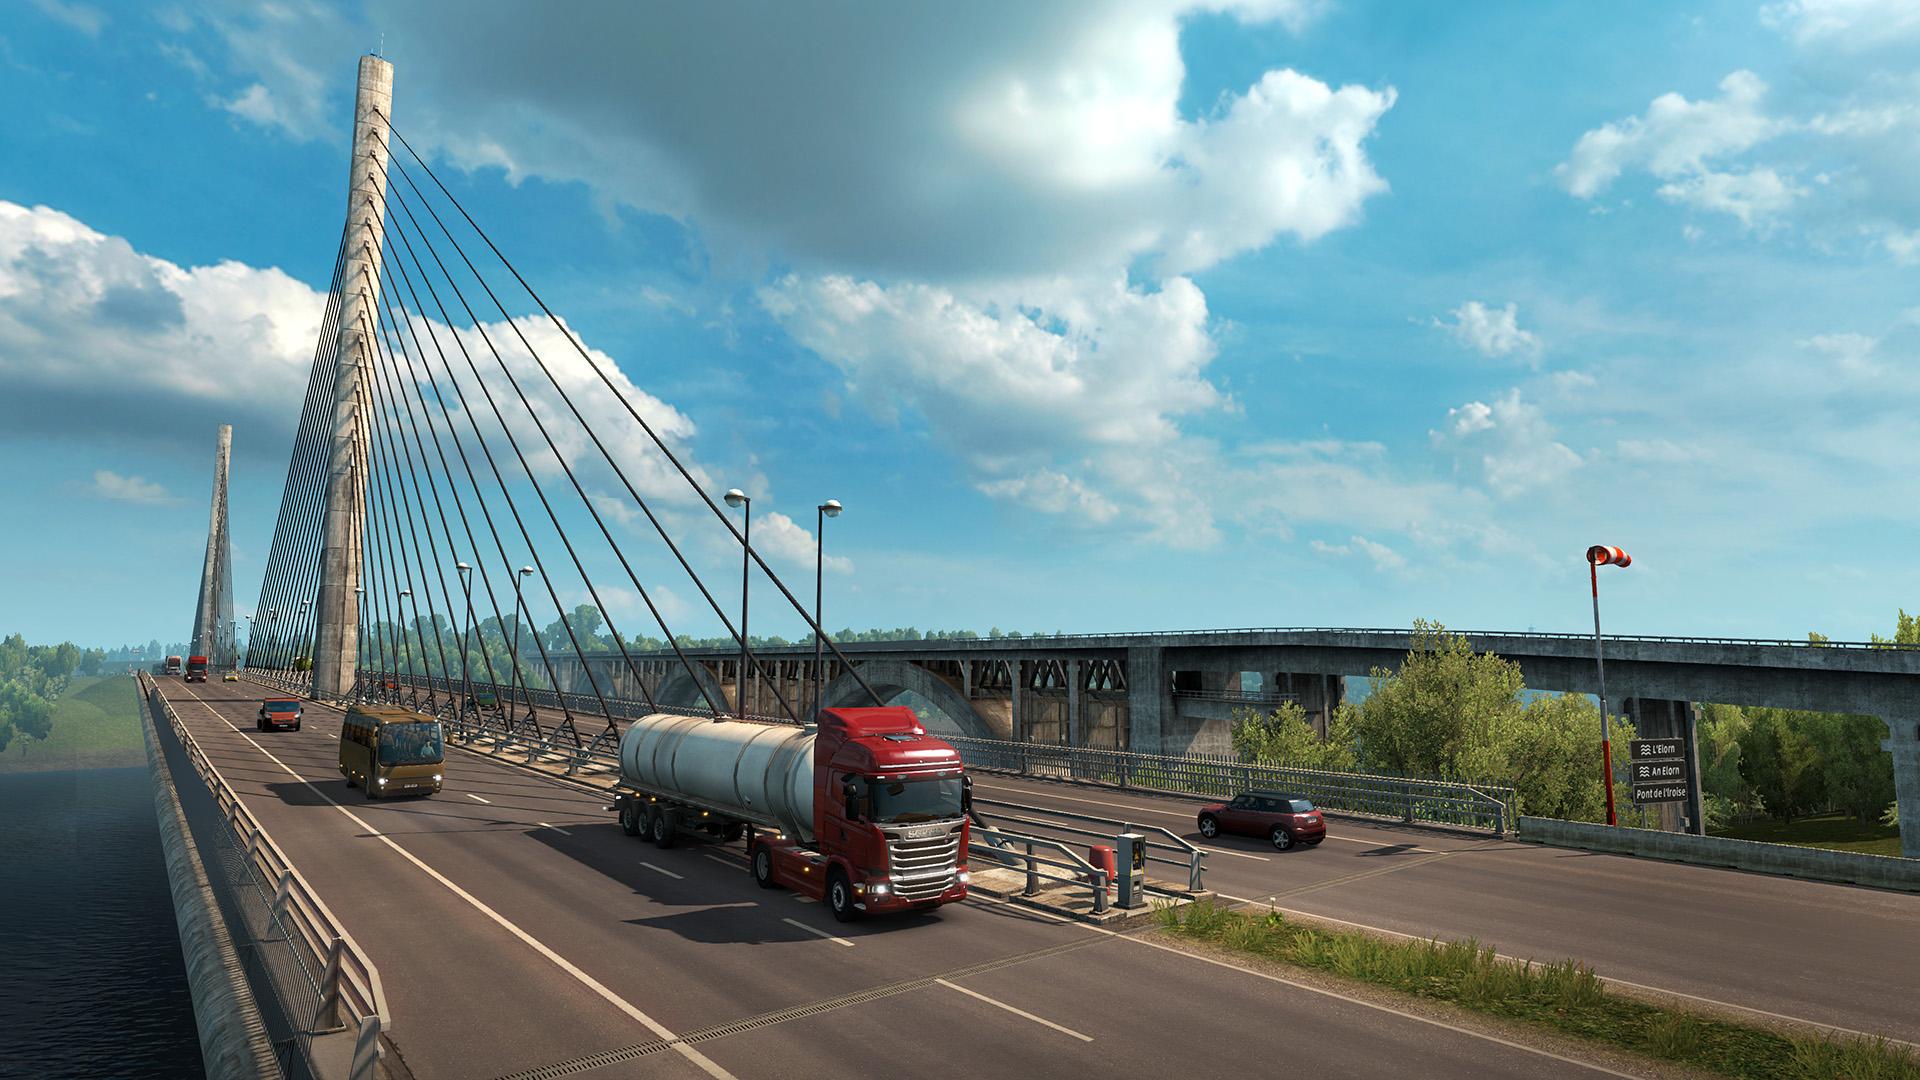 Euro Truck Simulator 2, dílo českého studia SCS Software